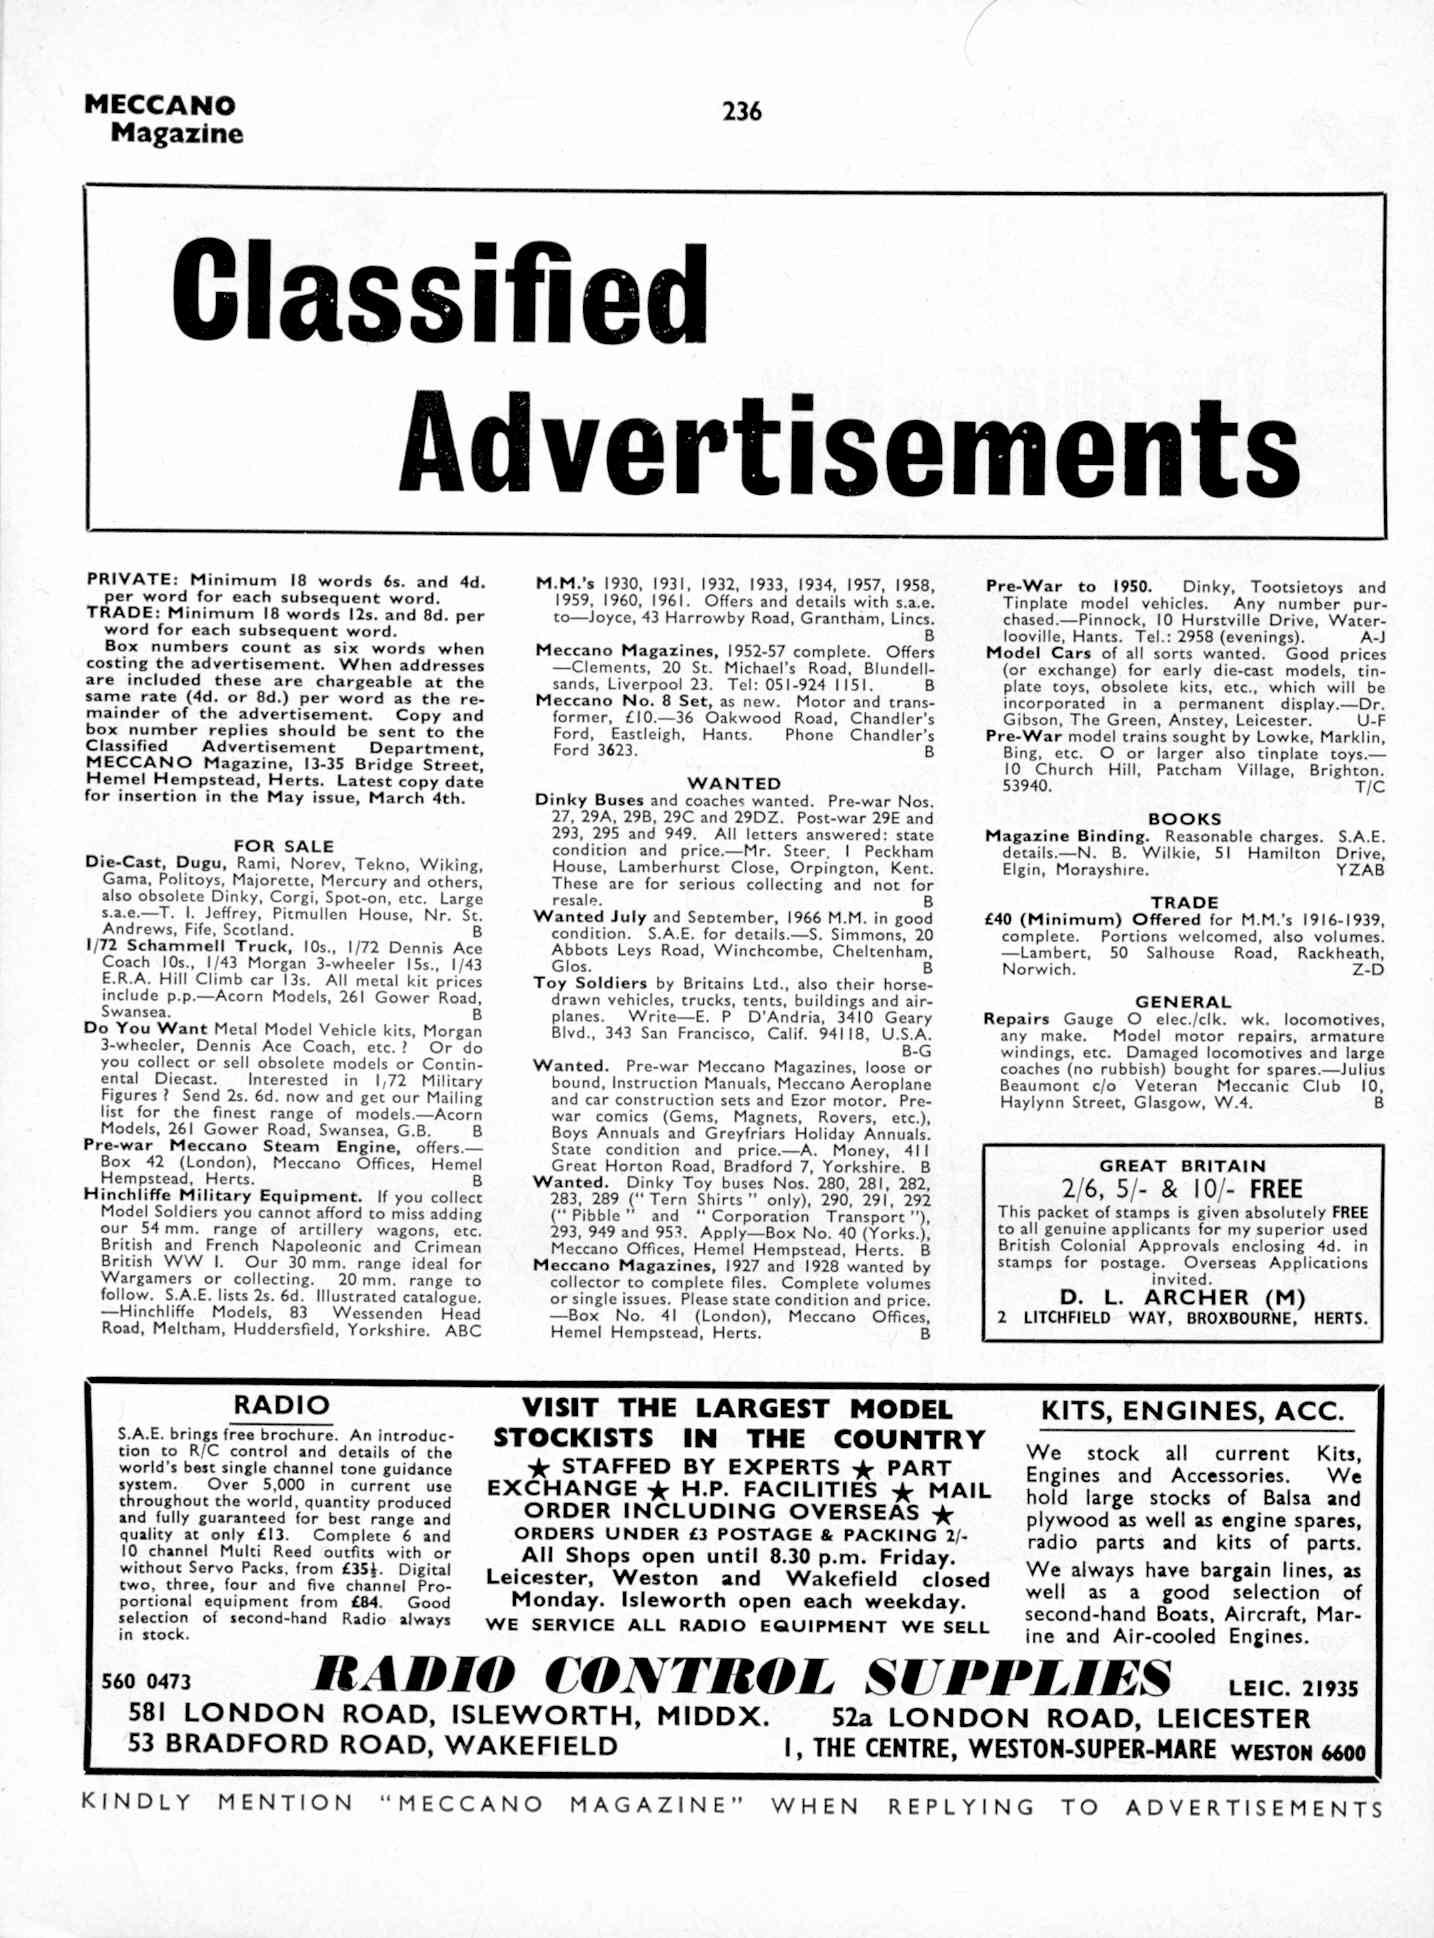 UK Meccano Magazine April 1970 Page 236